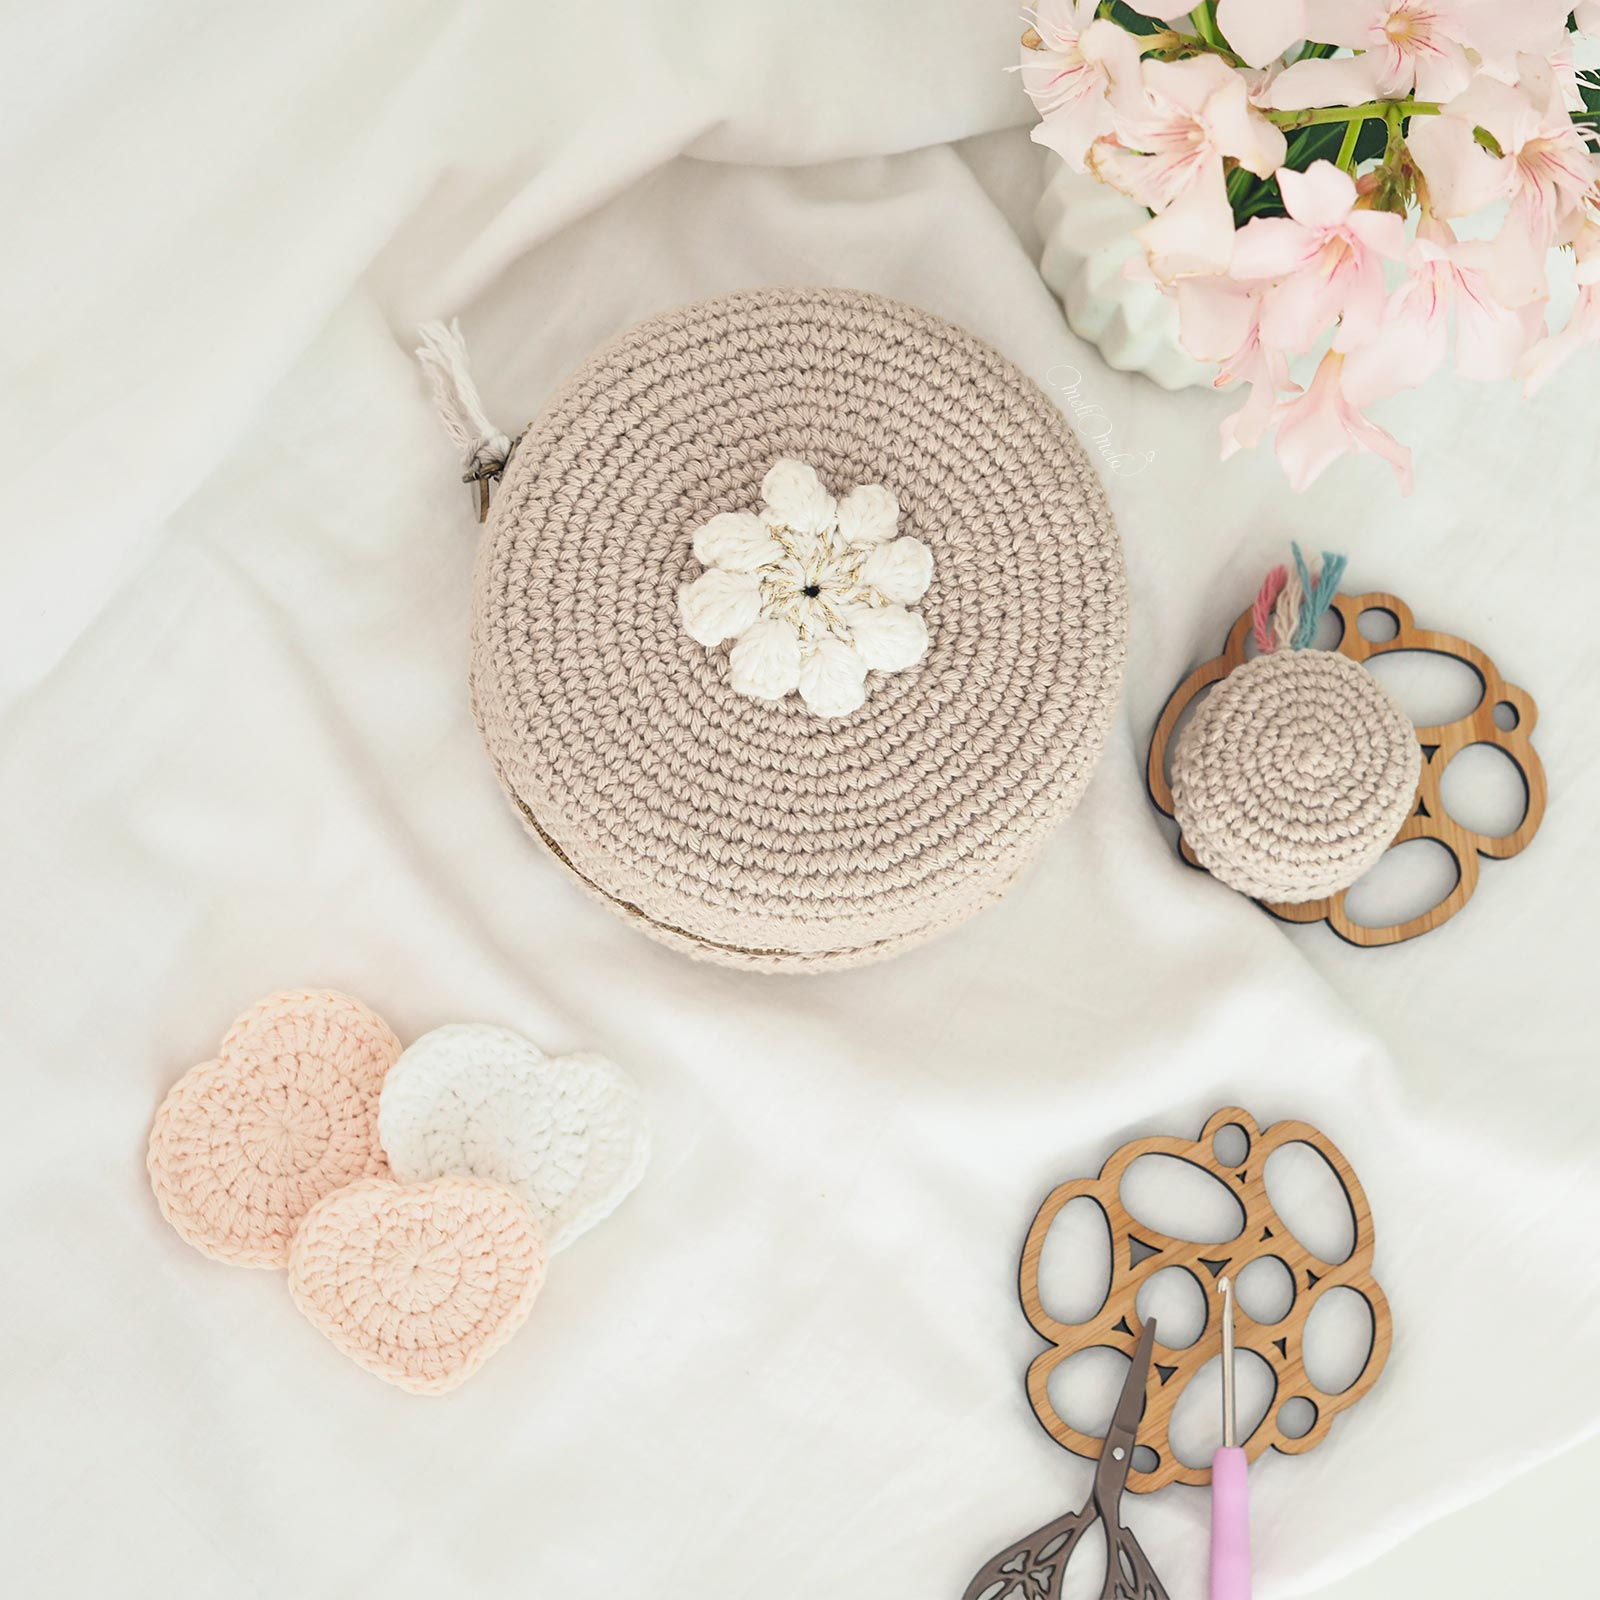 écrins macaron upcycling crochet   ricorumi tuto chouettekit laboutiquedemelimelo